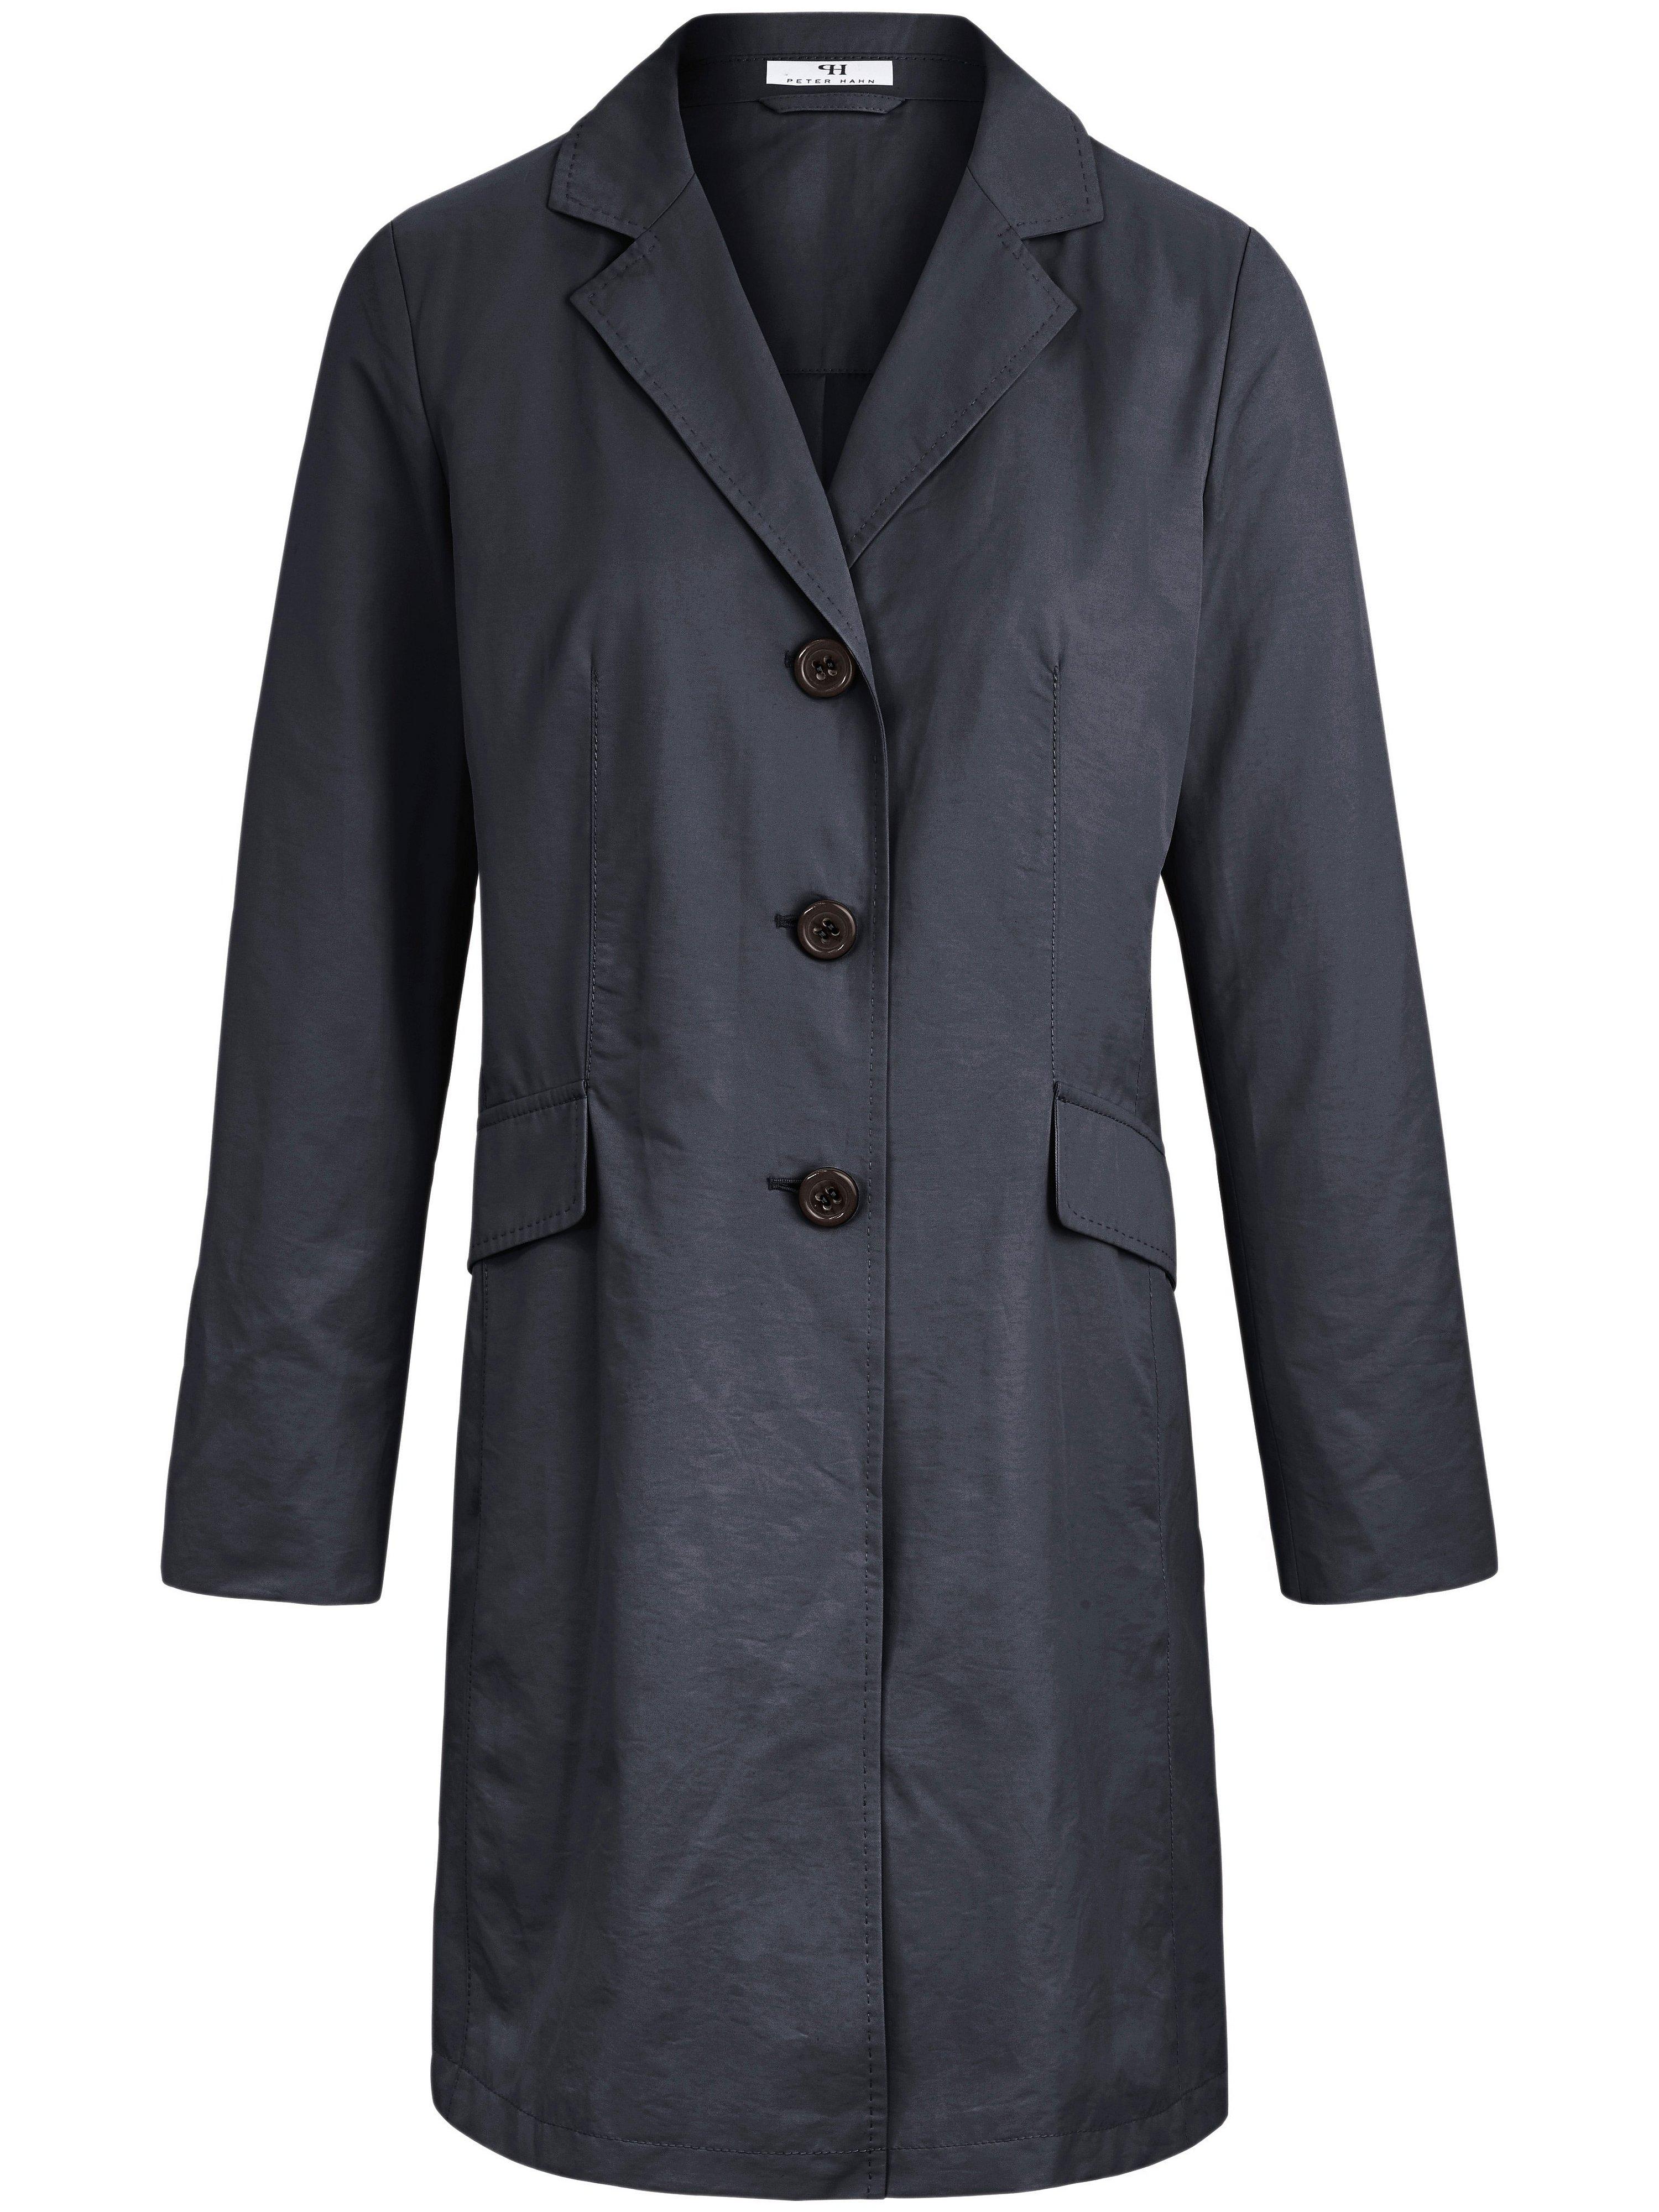 Le manteau 3/4 micro-coton  Peter Hahn bleu taille 24